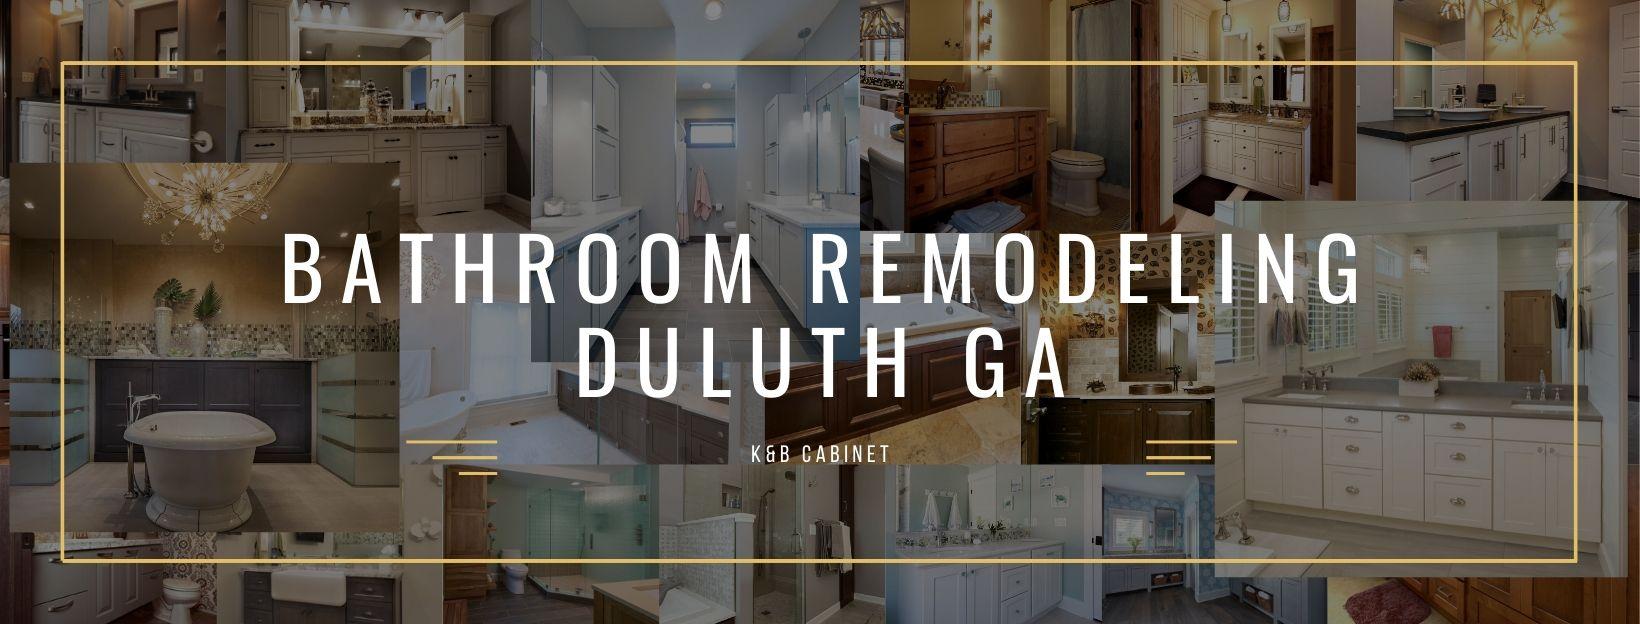 Bathroom Remodeling Duluth GA